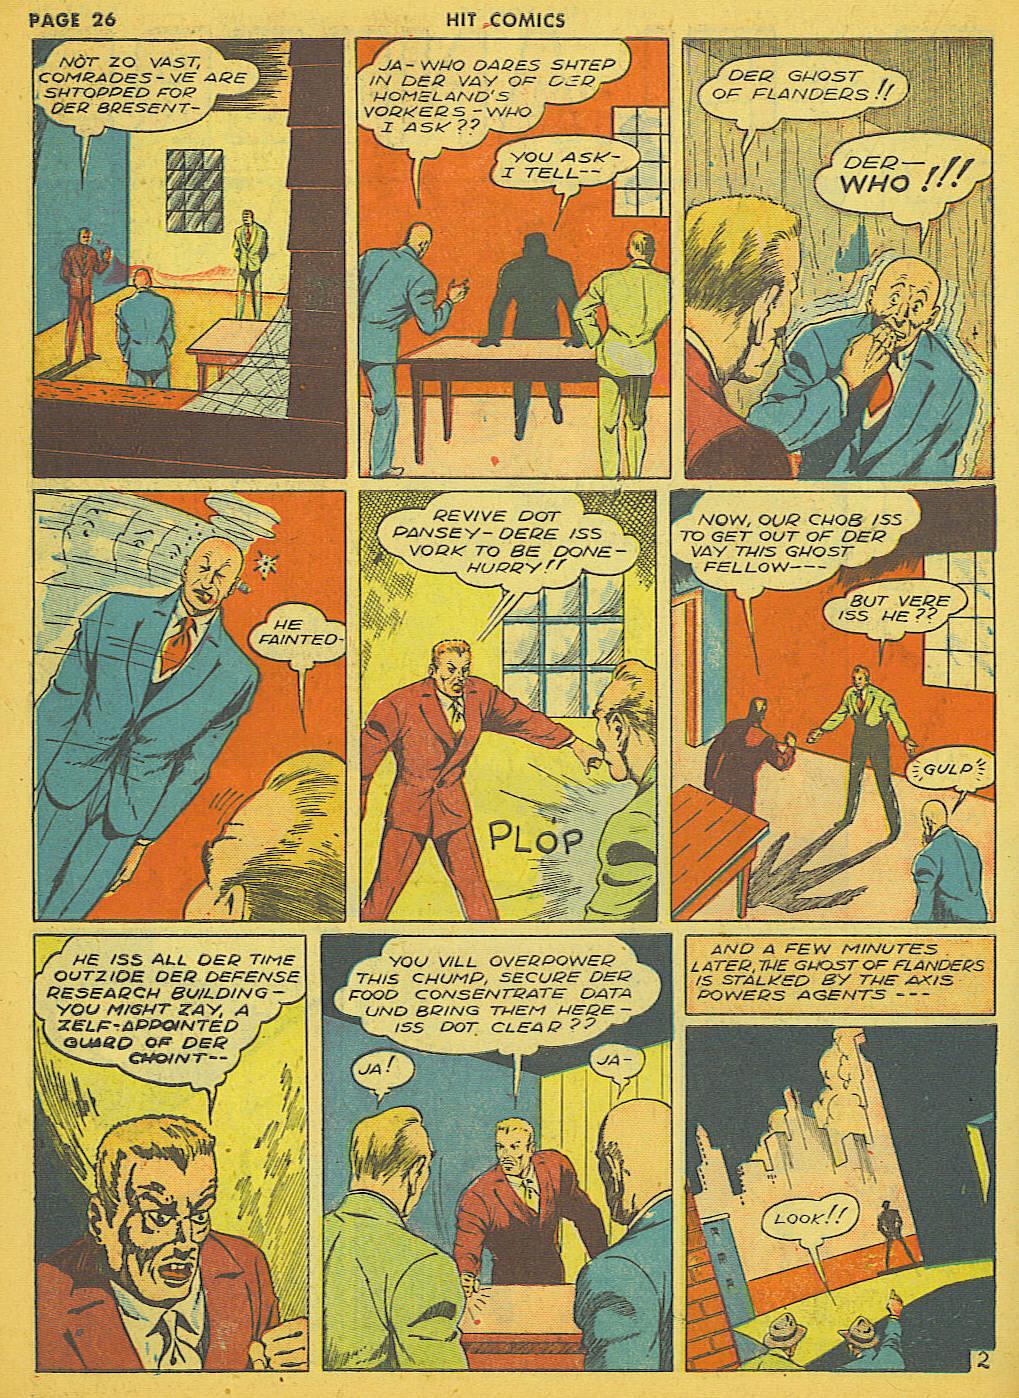 Read online Hit Comics comic -  Issue #21 - 28